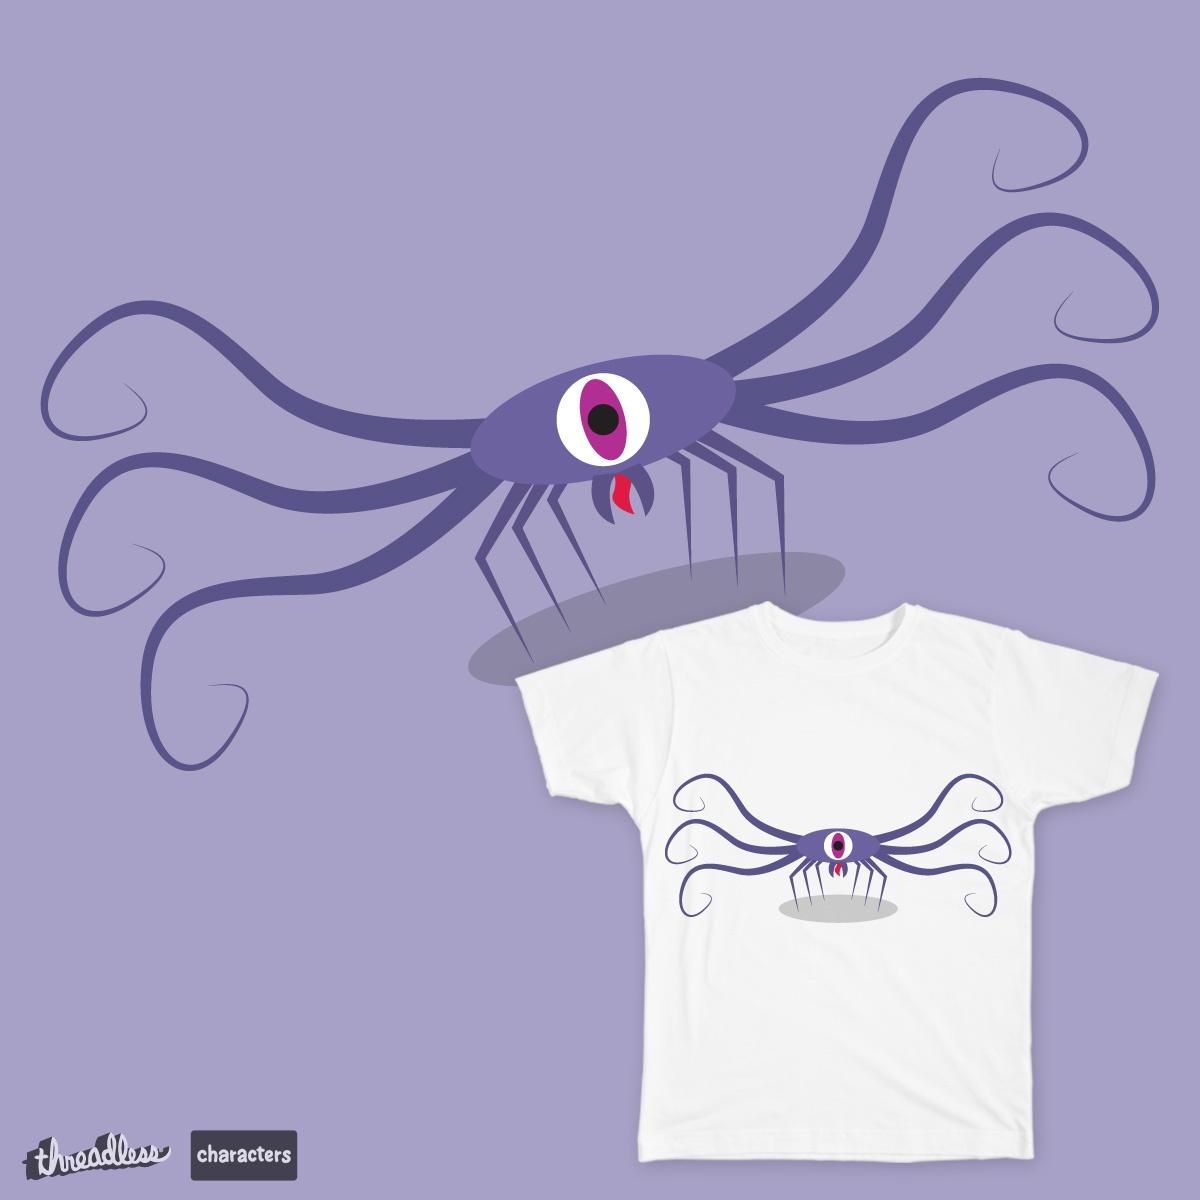 Octolly by jayman93 on Threadless